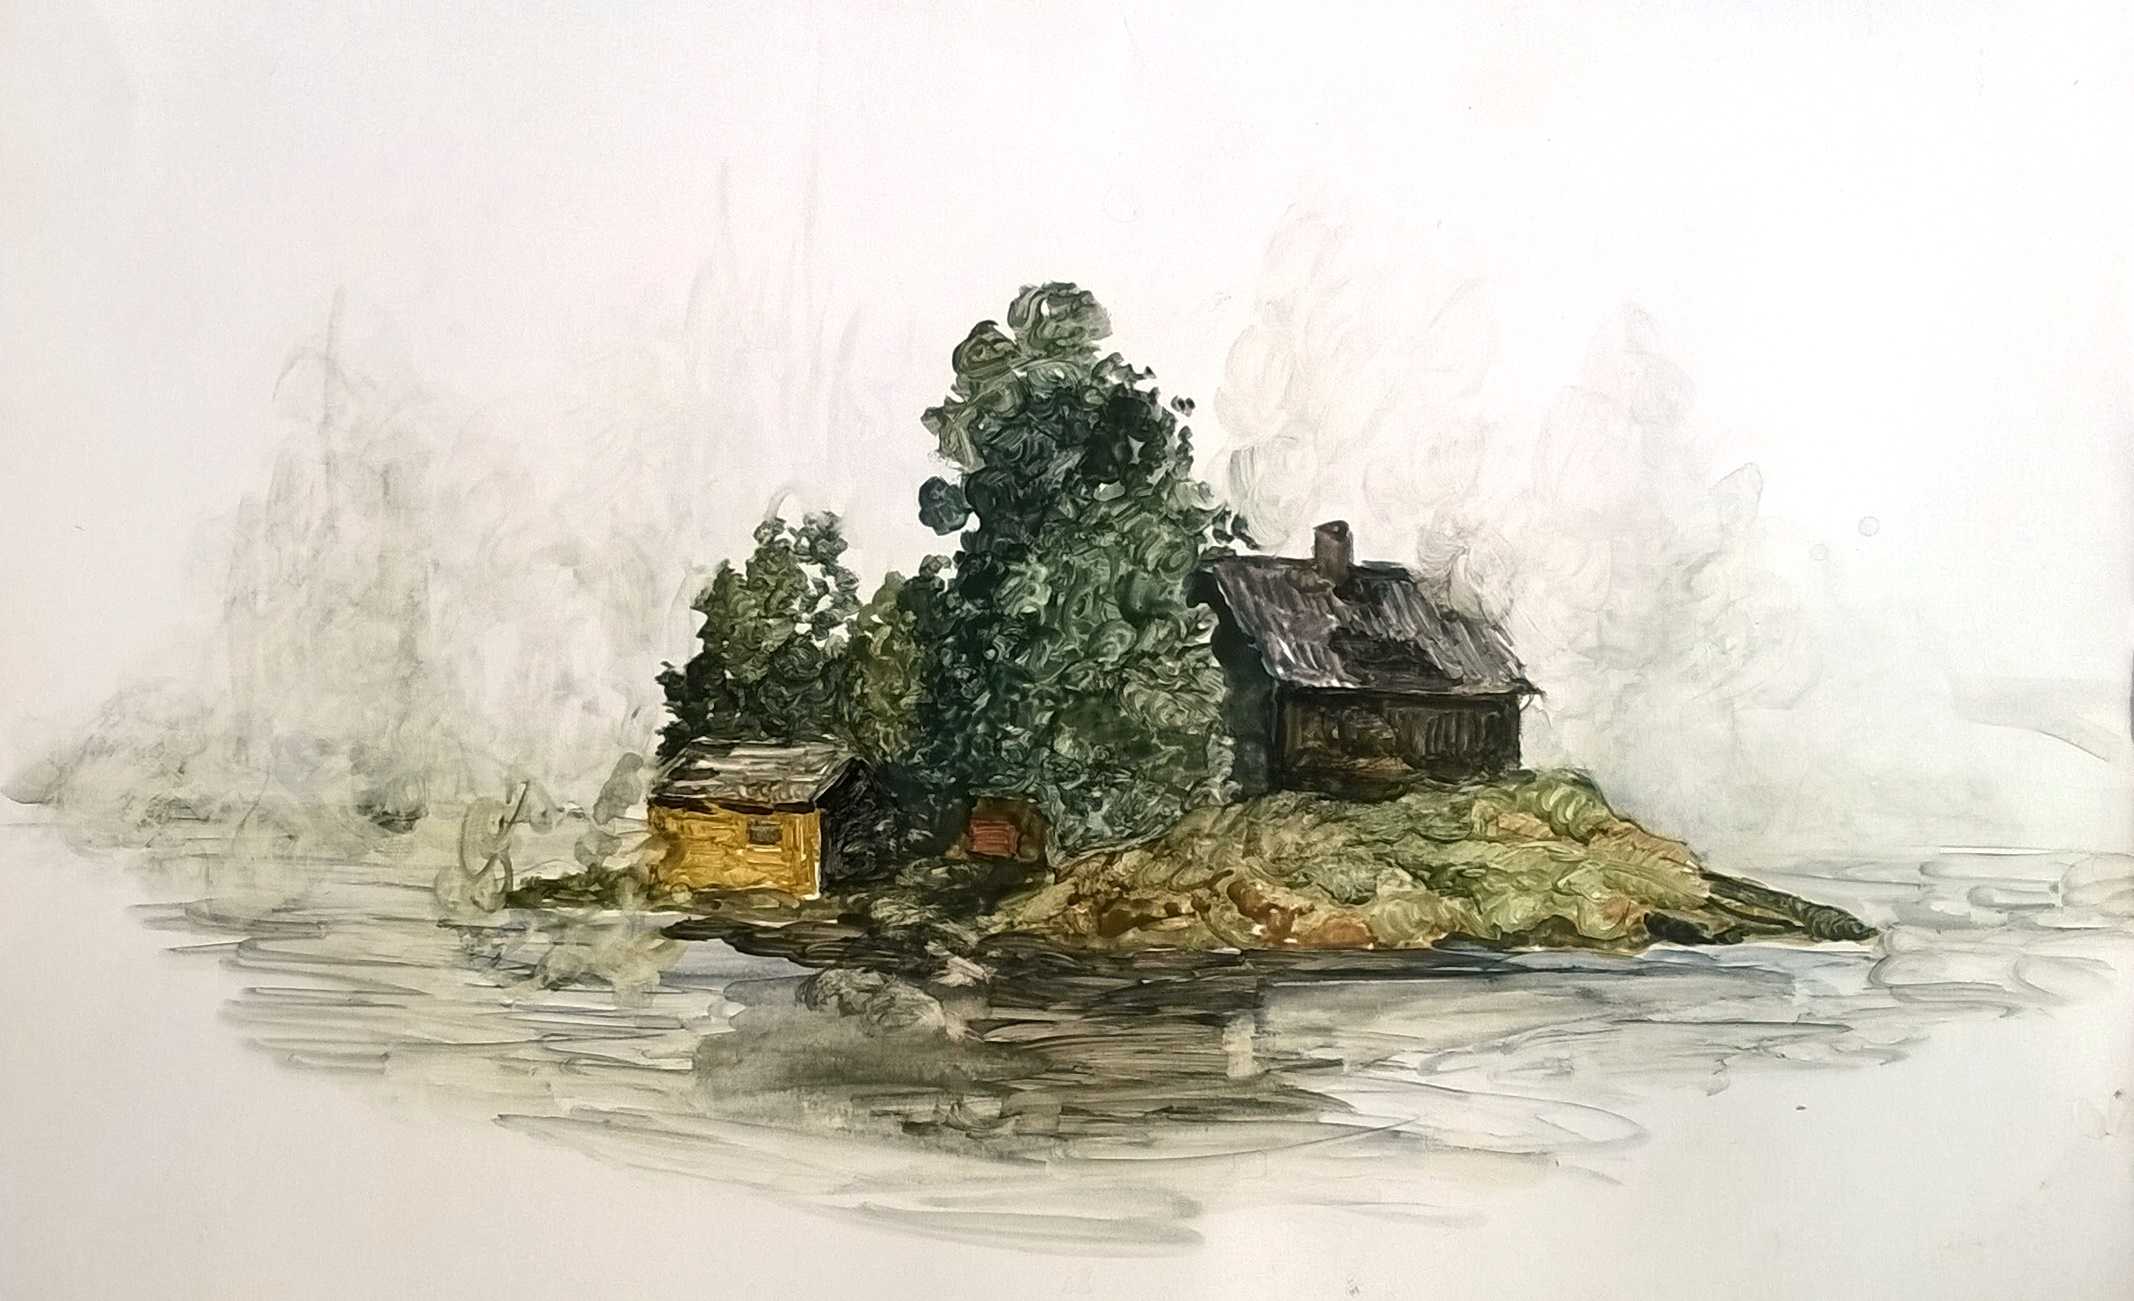 Island Mist Rain - 2017